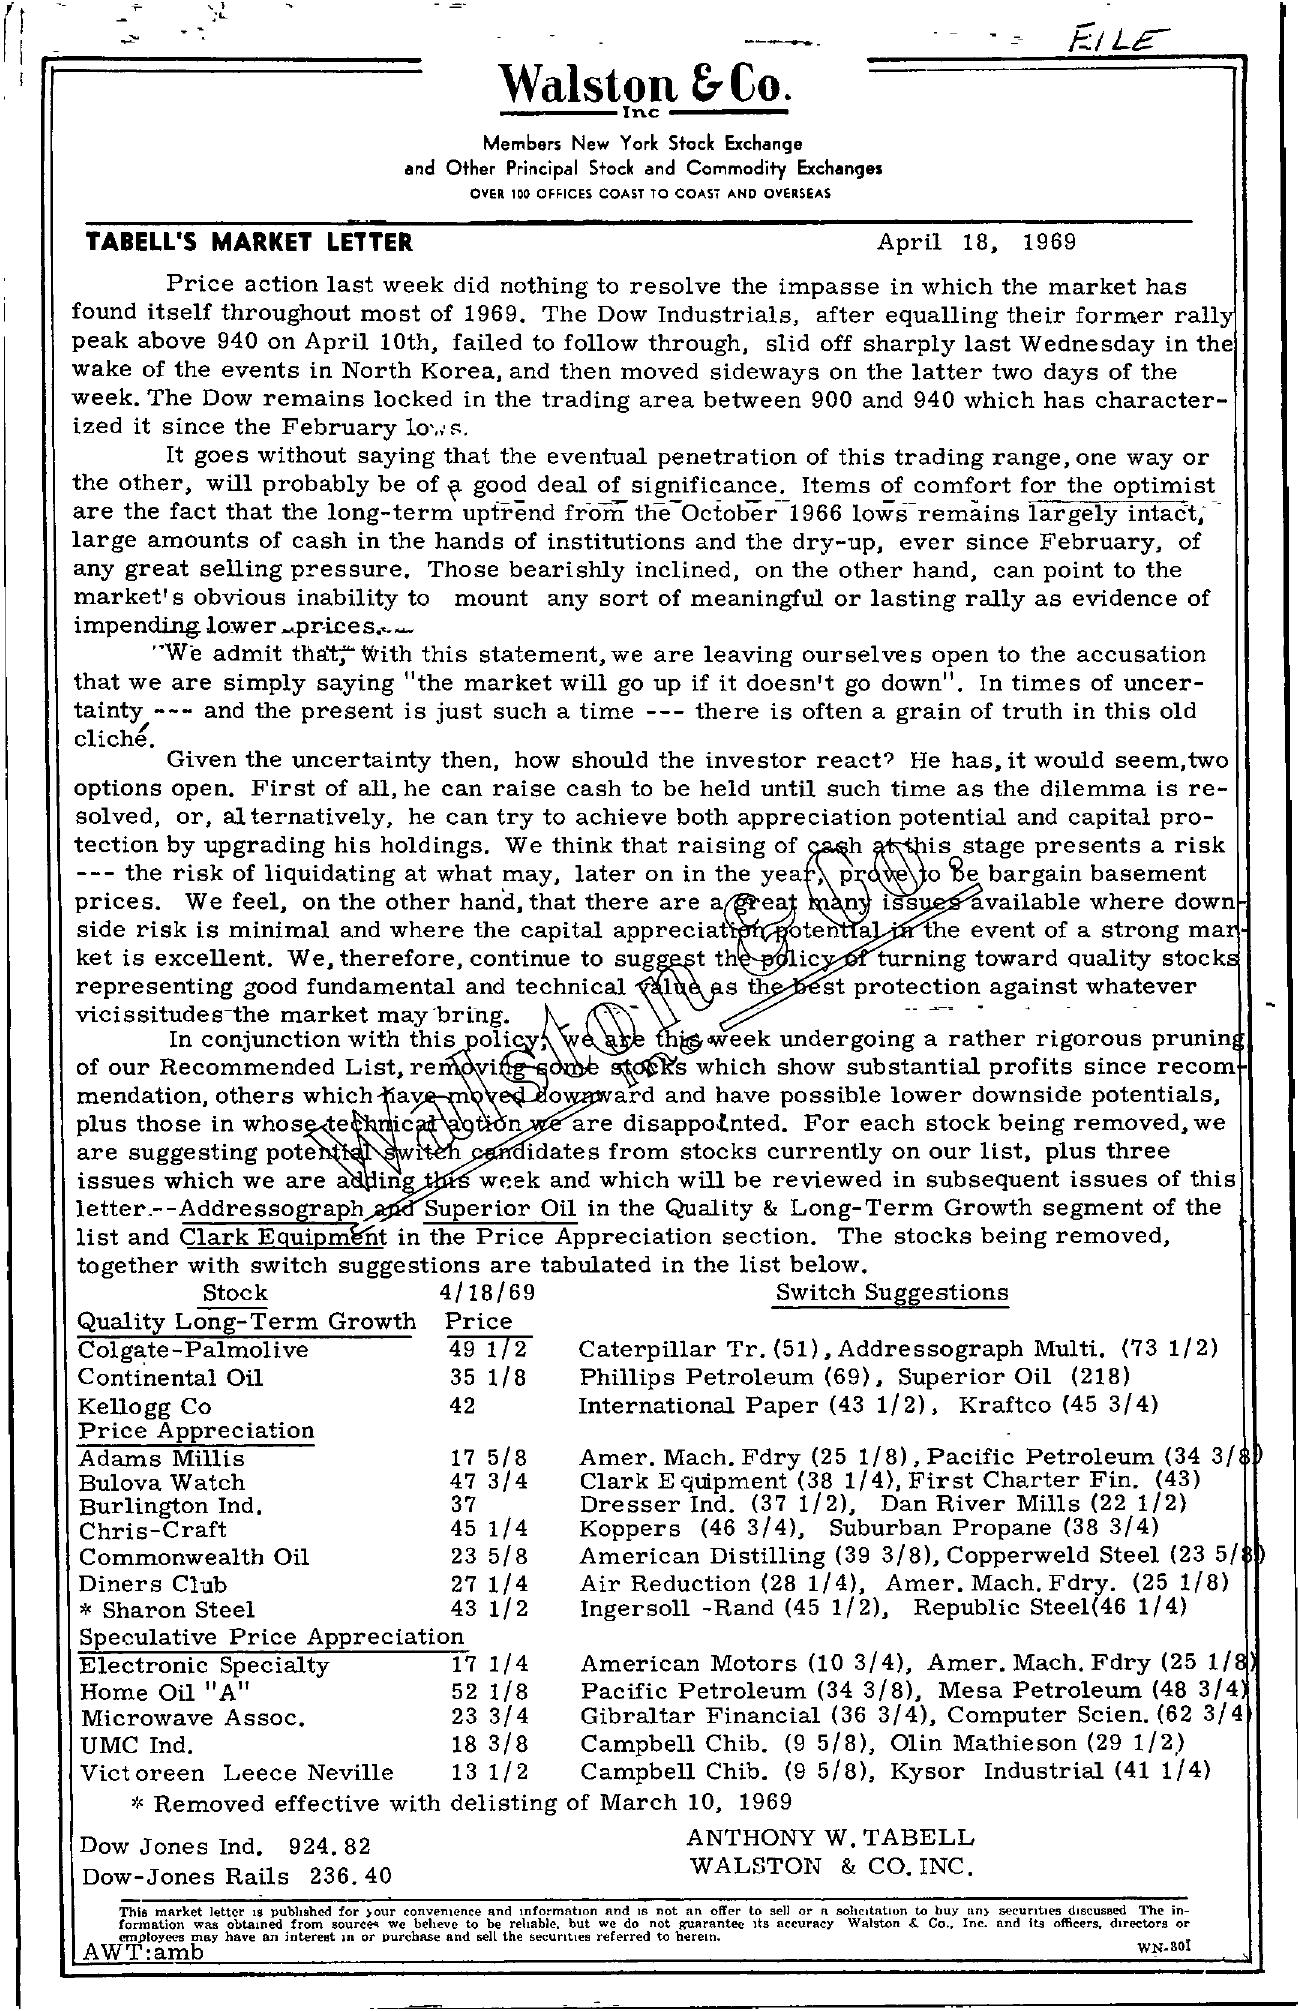 Tabell's Market Letter - April 18, 1969